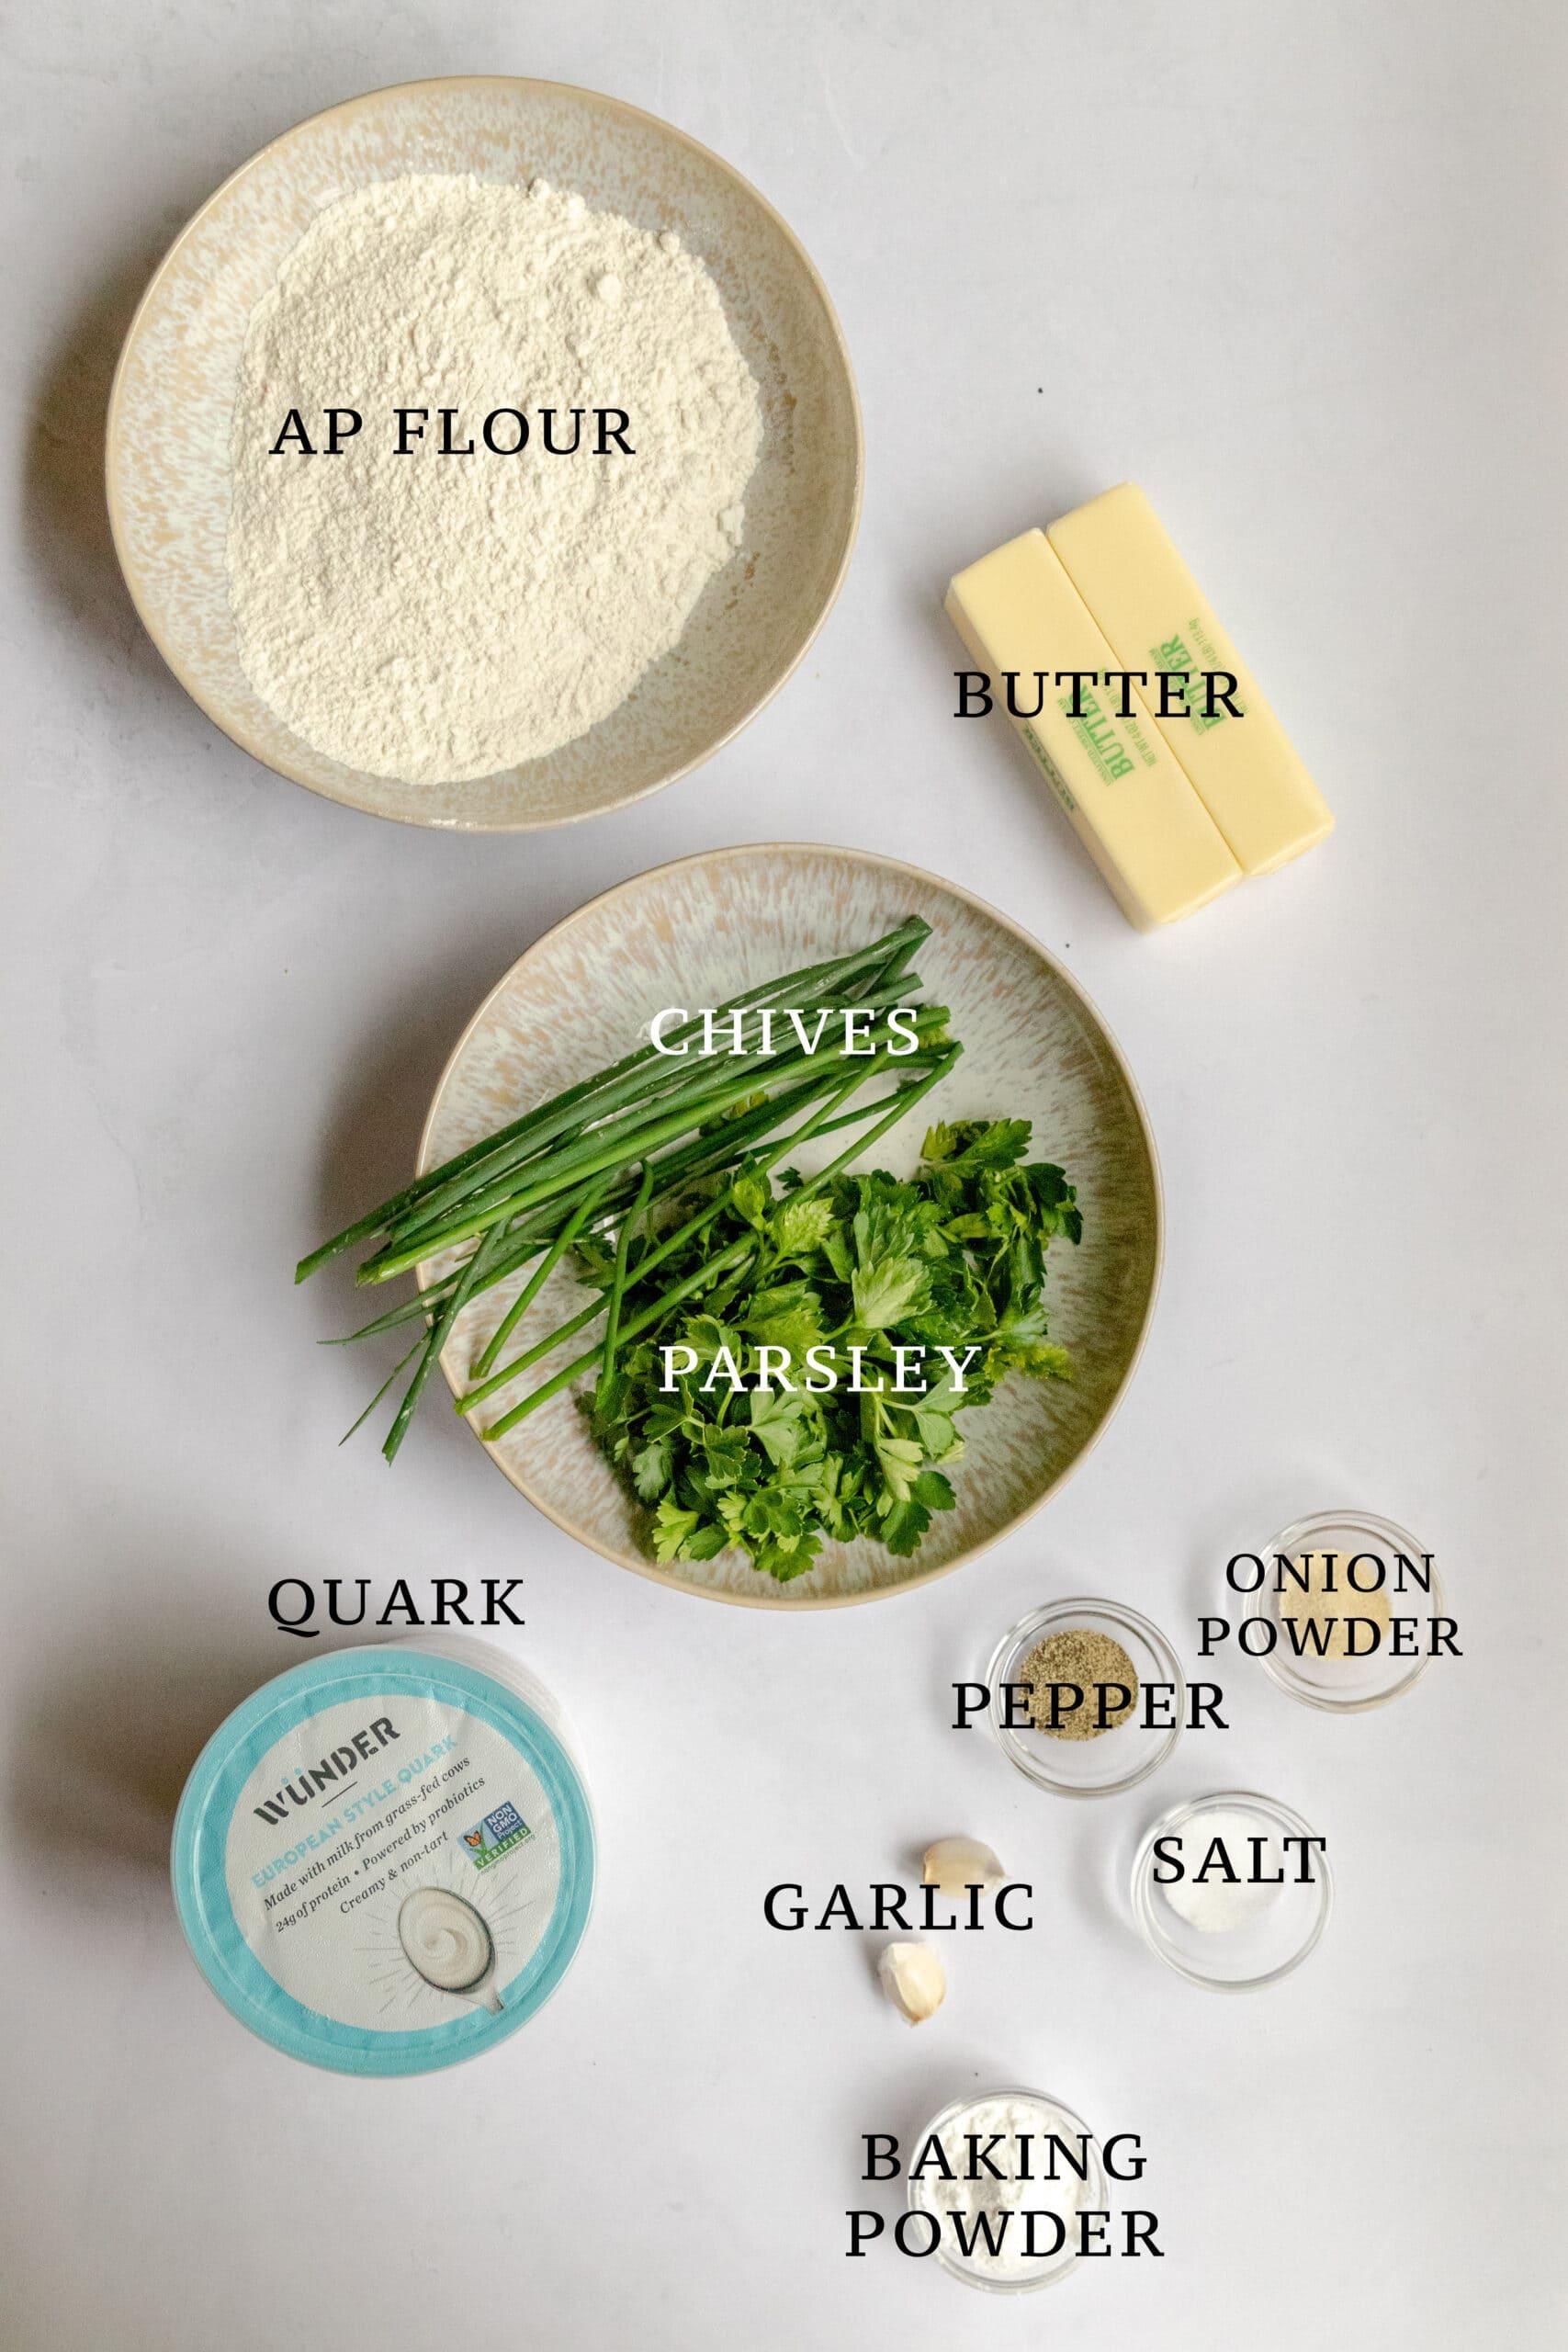 Image of the ingredients needed for kräuter quark scones.